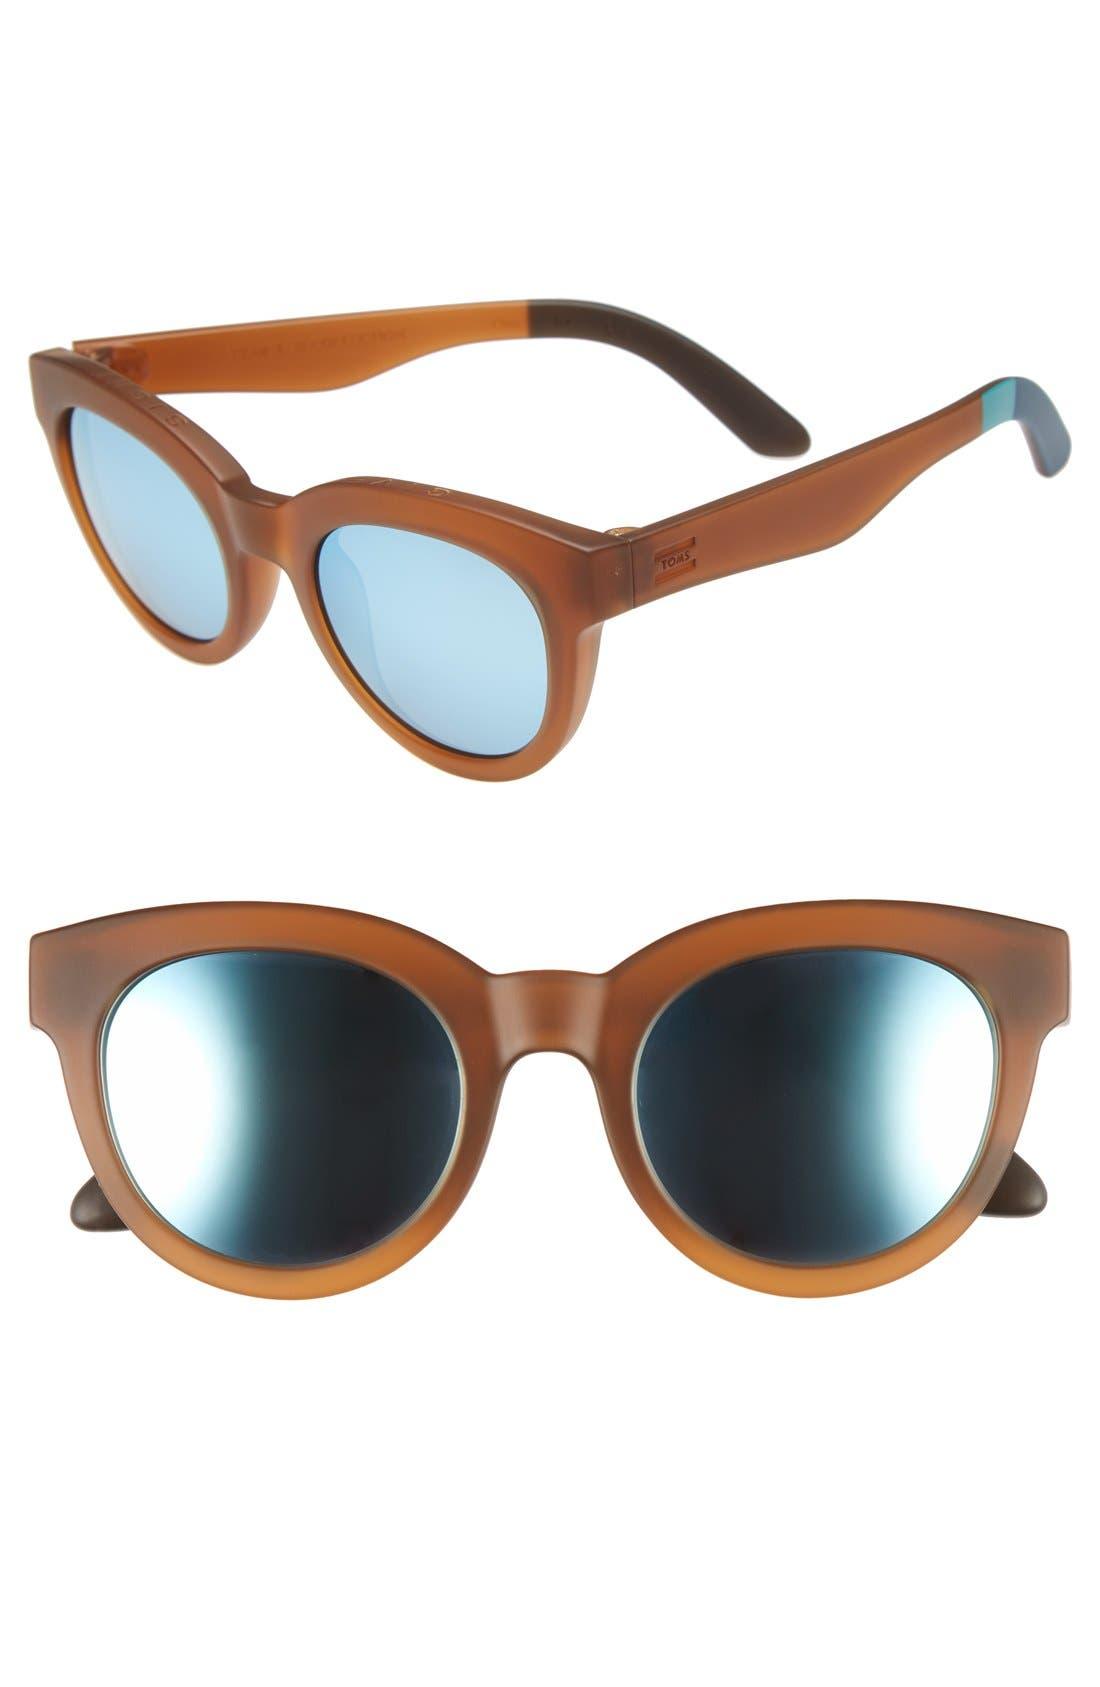 TOMS 'Florentin' 54mm Retro Sunglasses, Main, color, 200